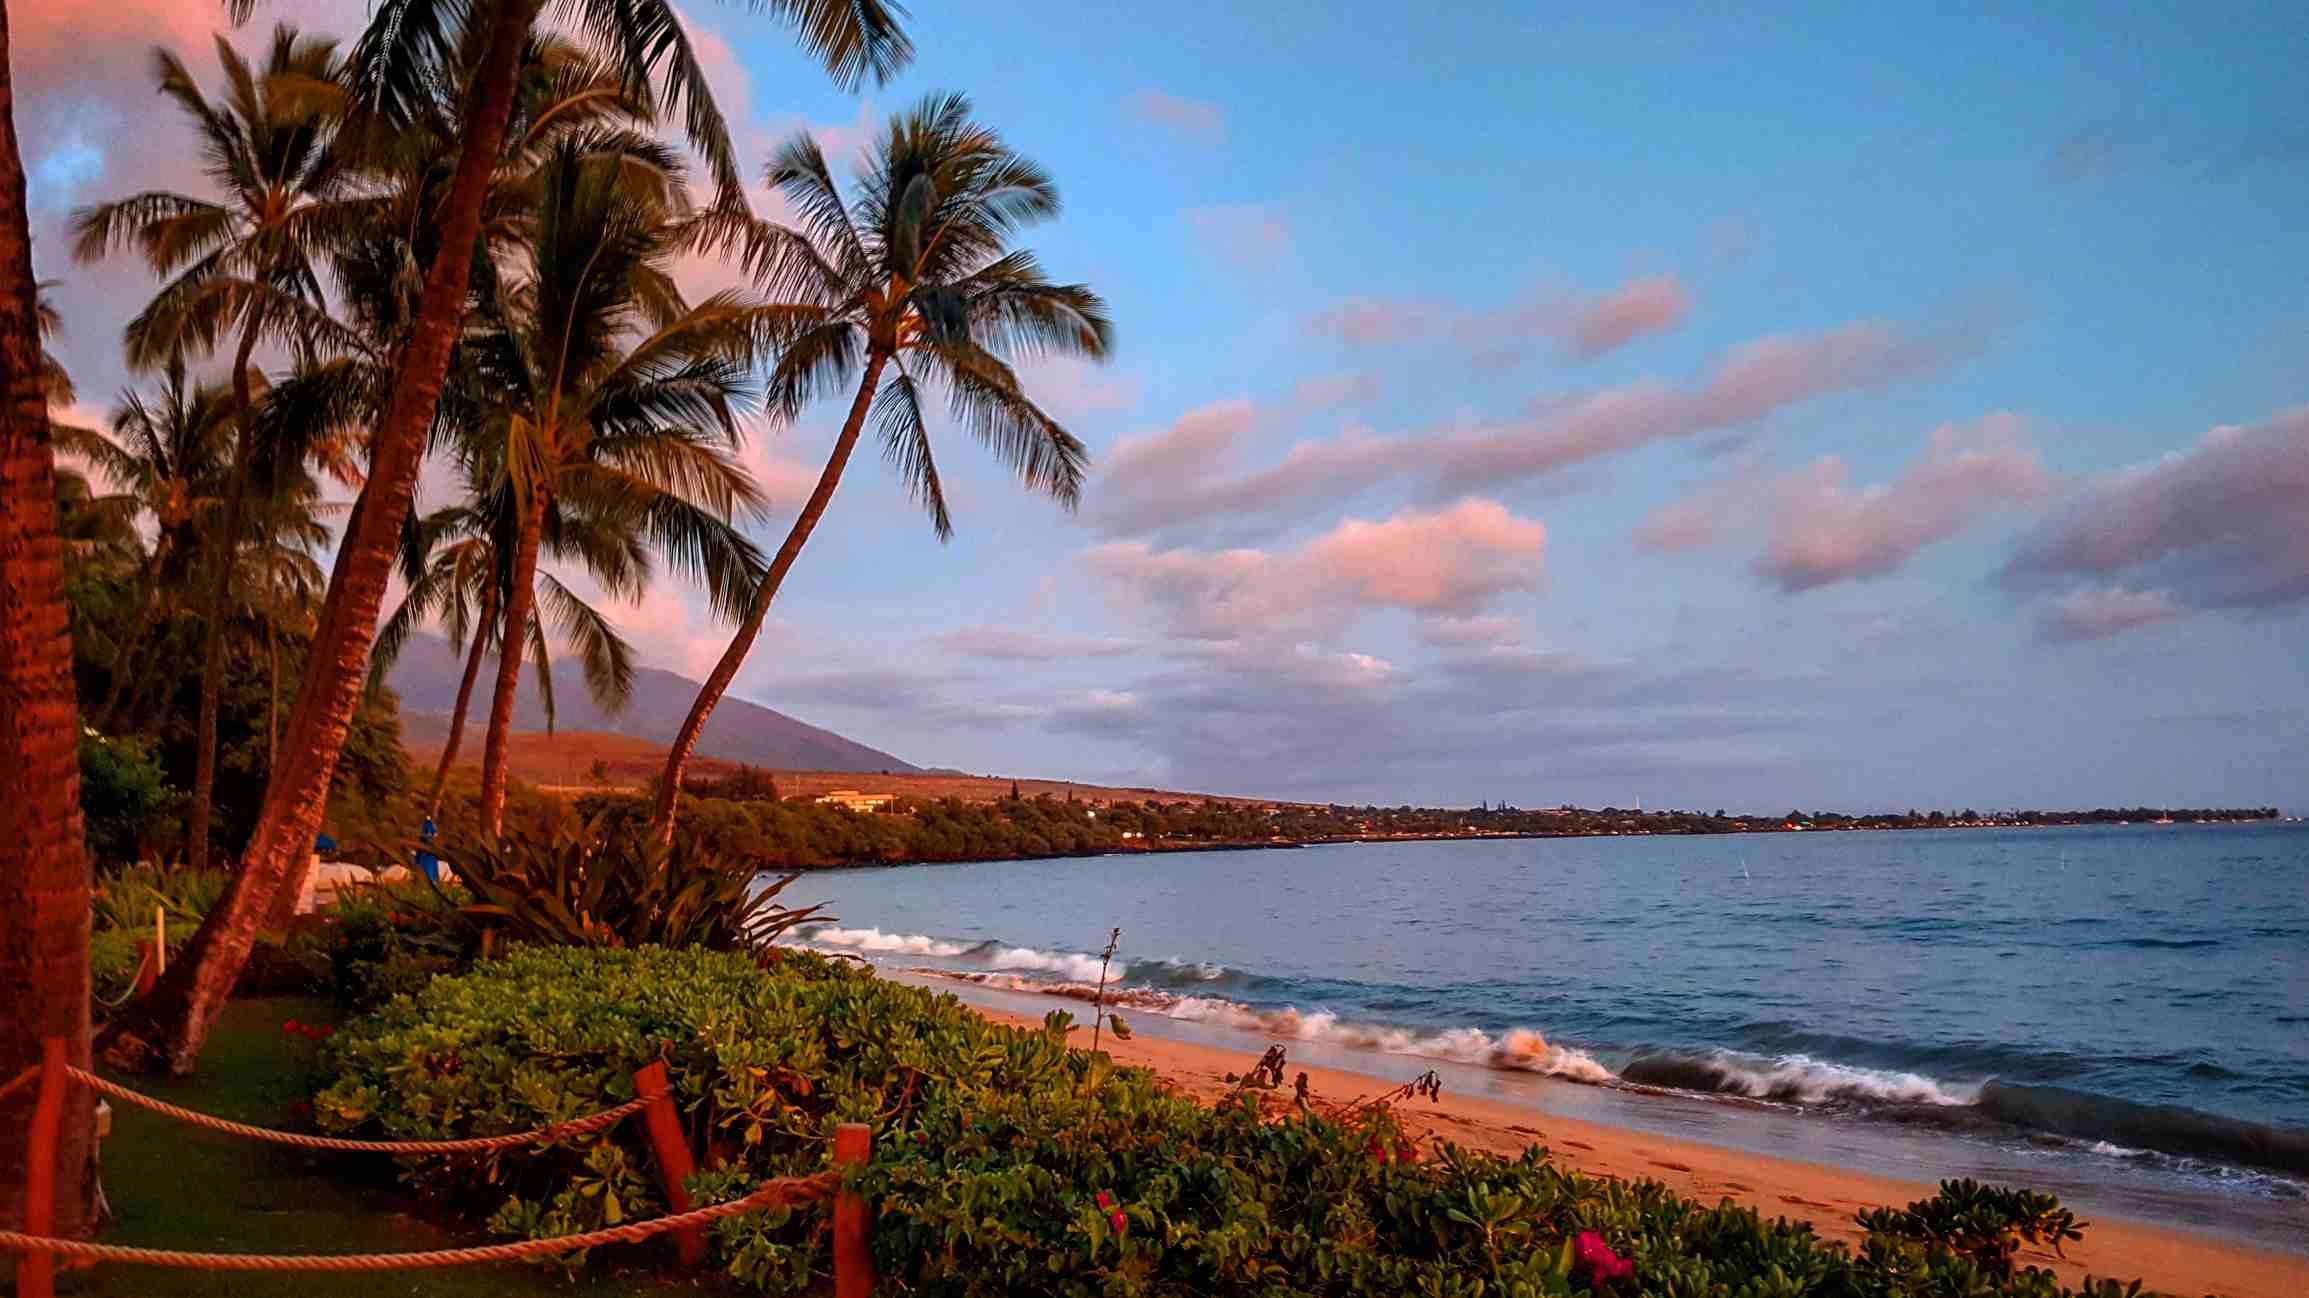 Sunset at Lahaina, Hawaii